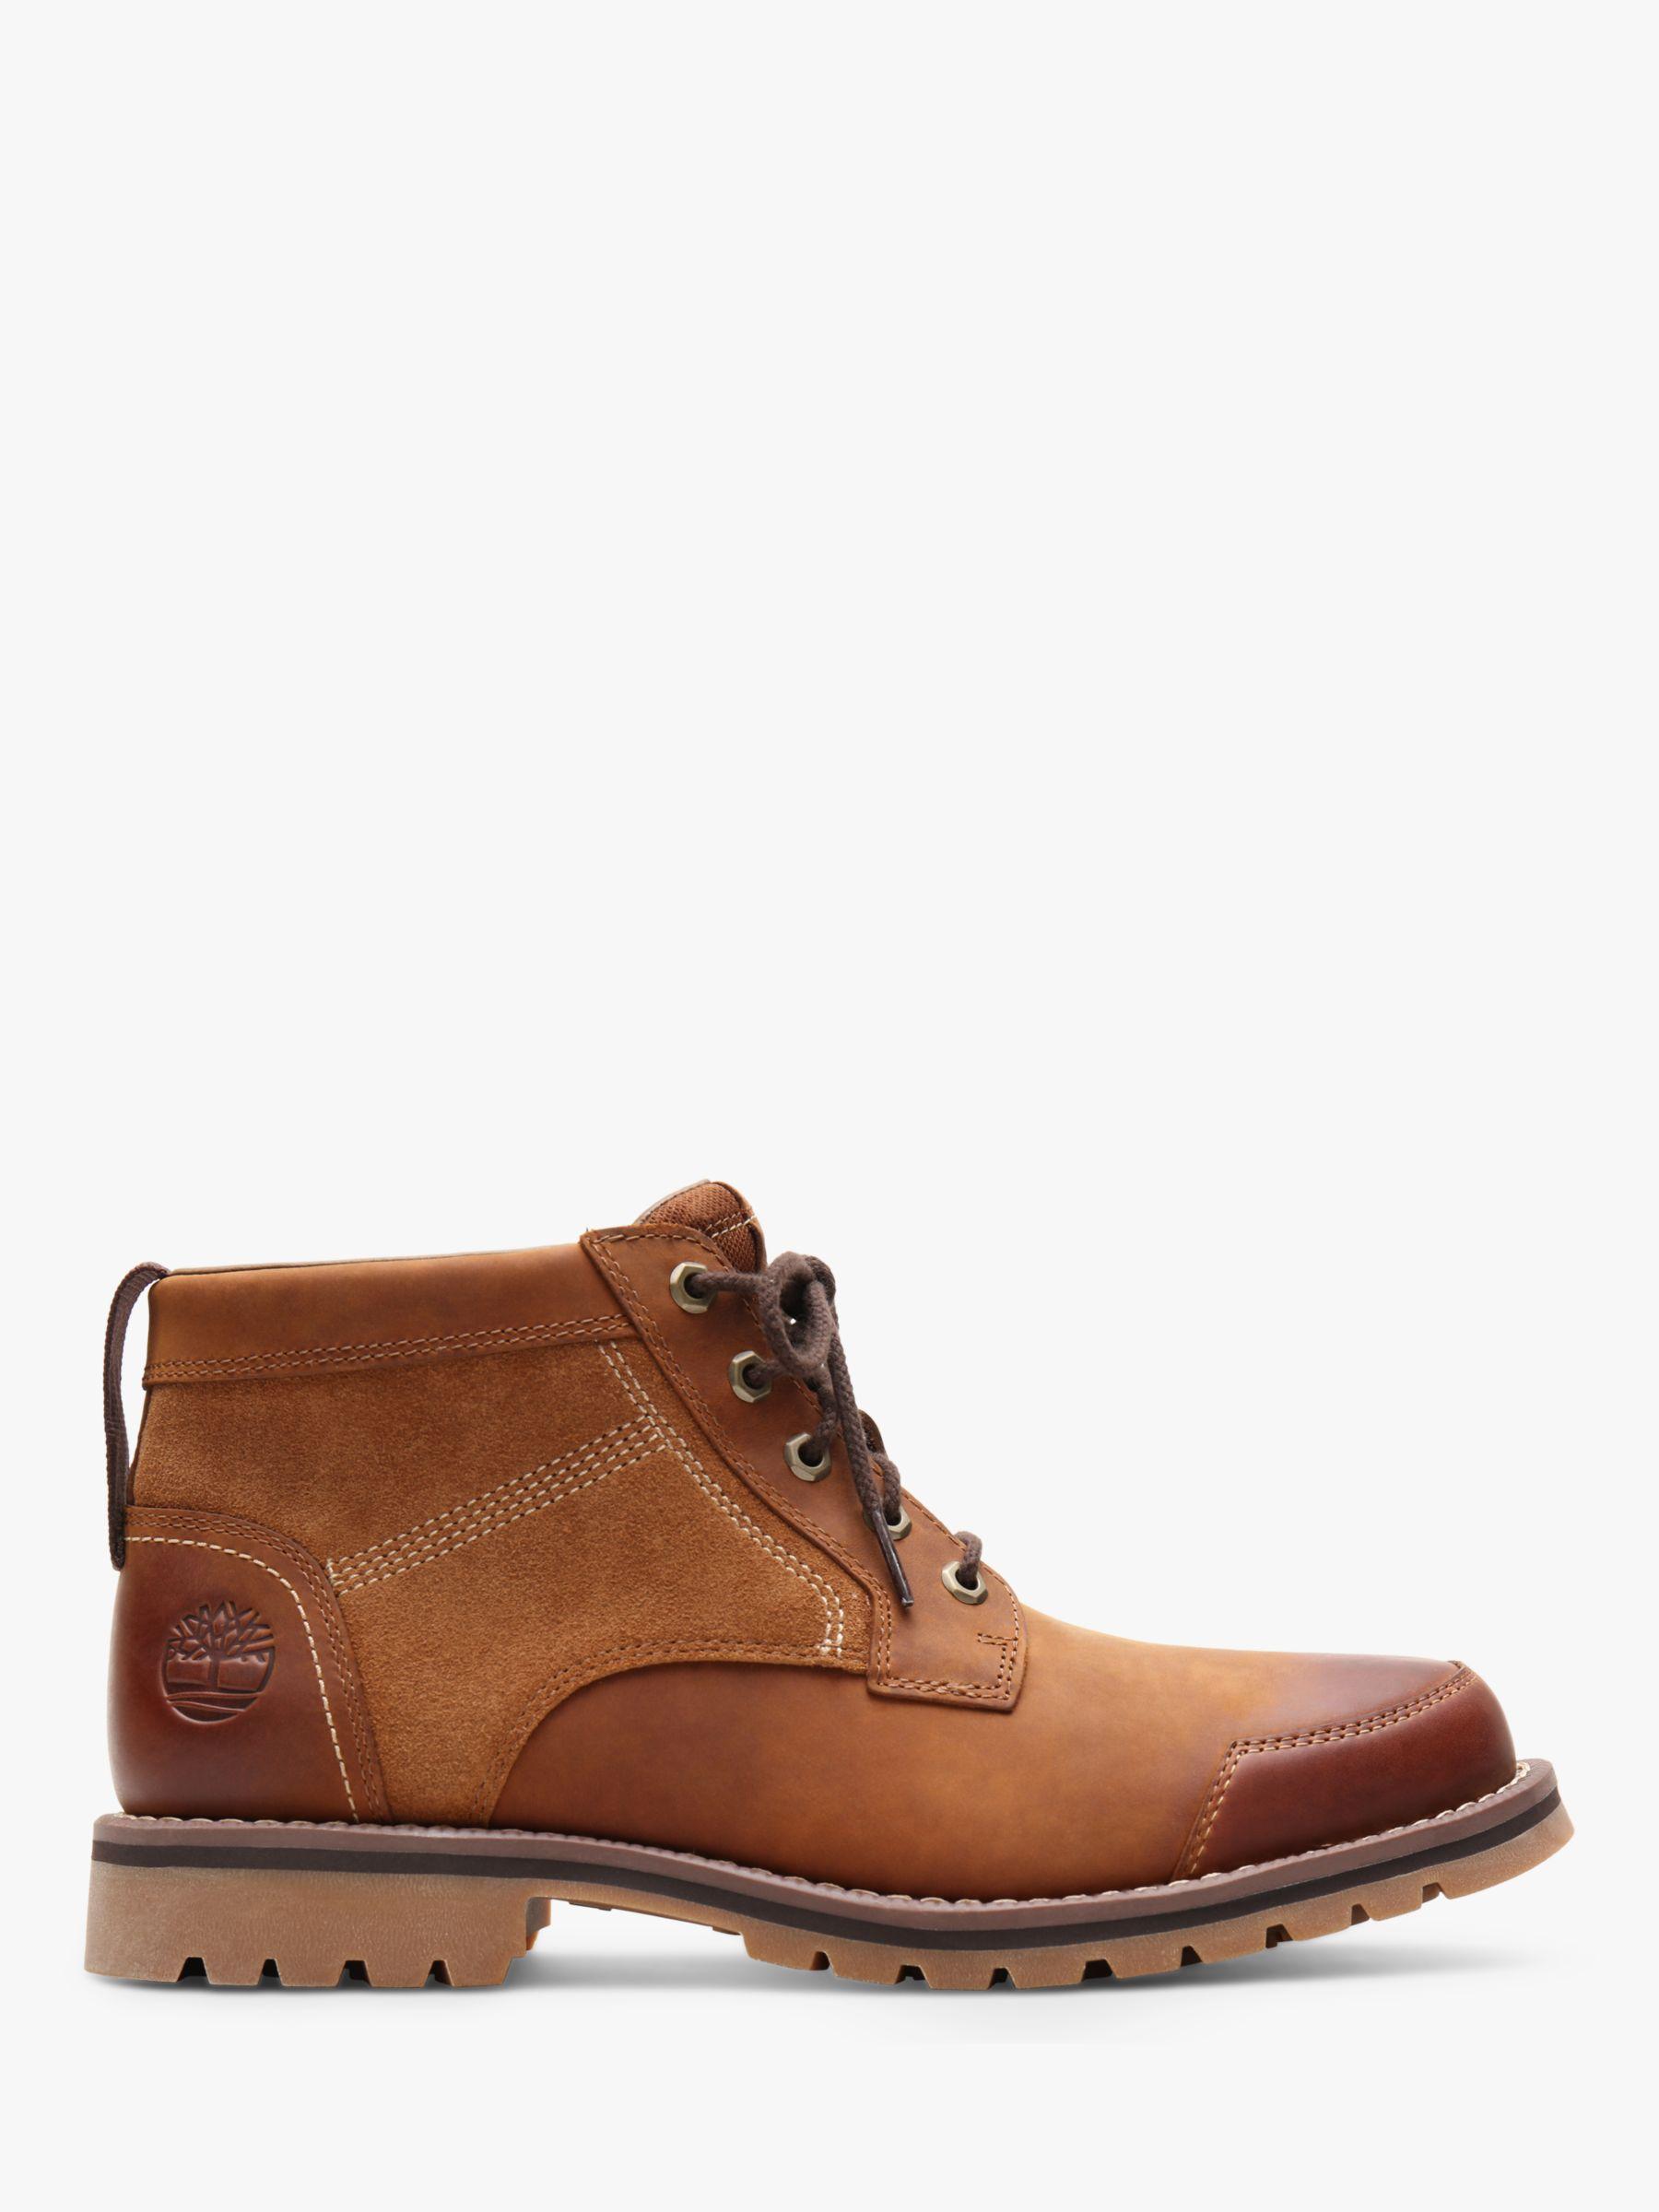 69b62f92b8c Timberland Larchmont Chukka Boot, Medium Brown, Medium Brown